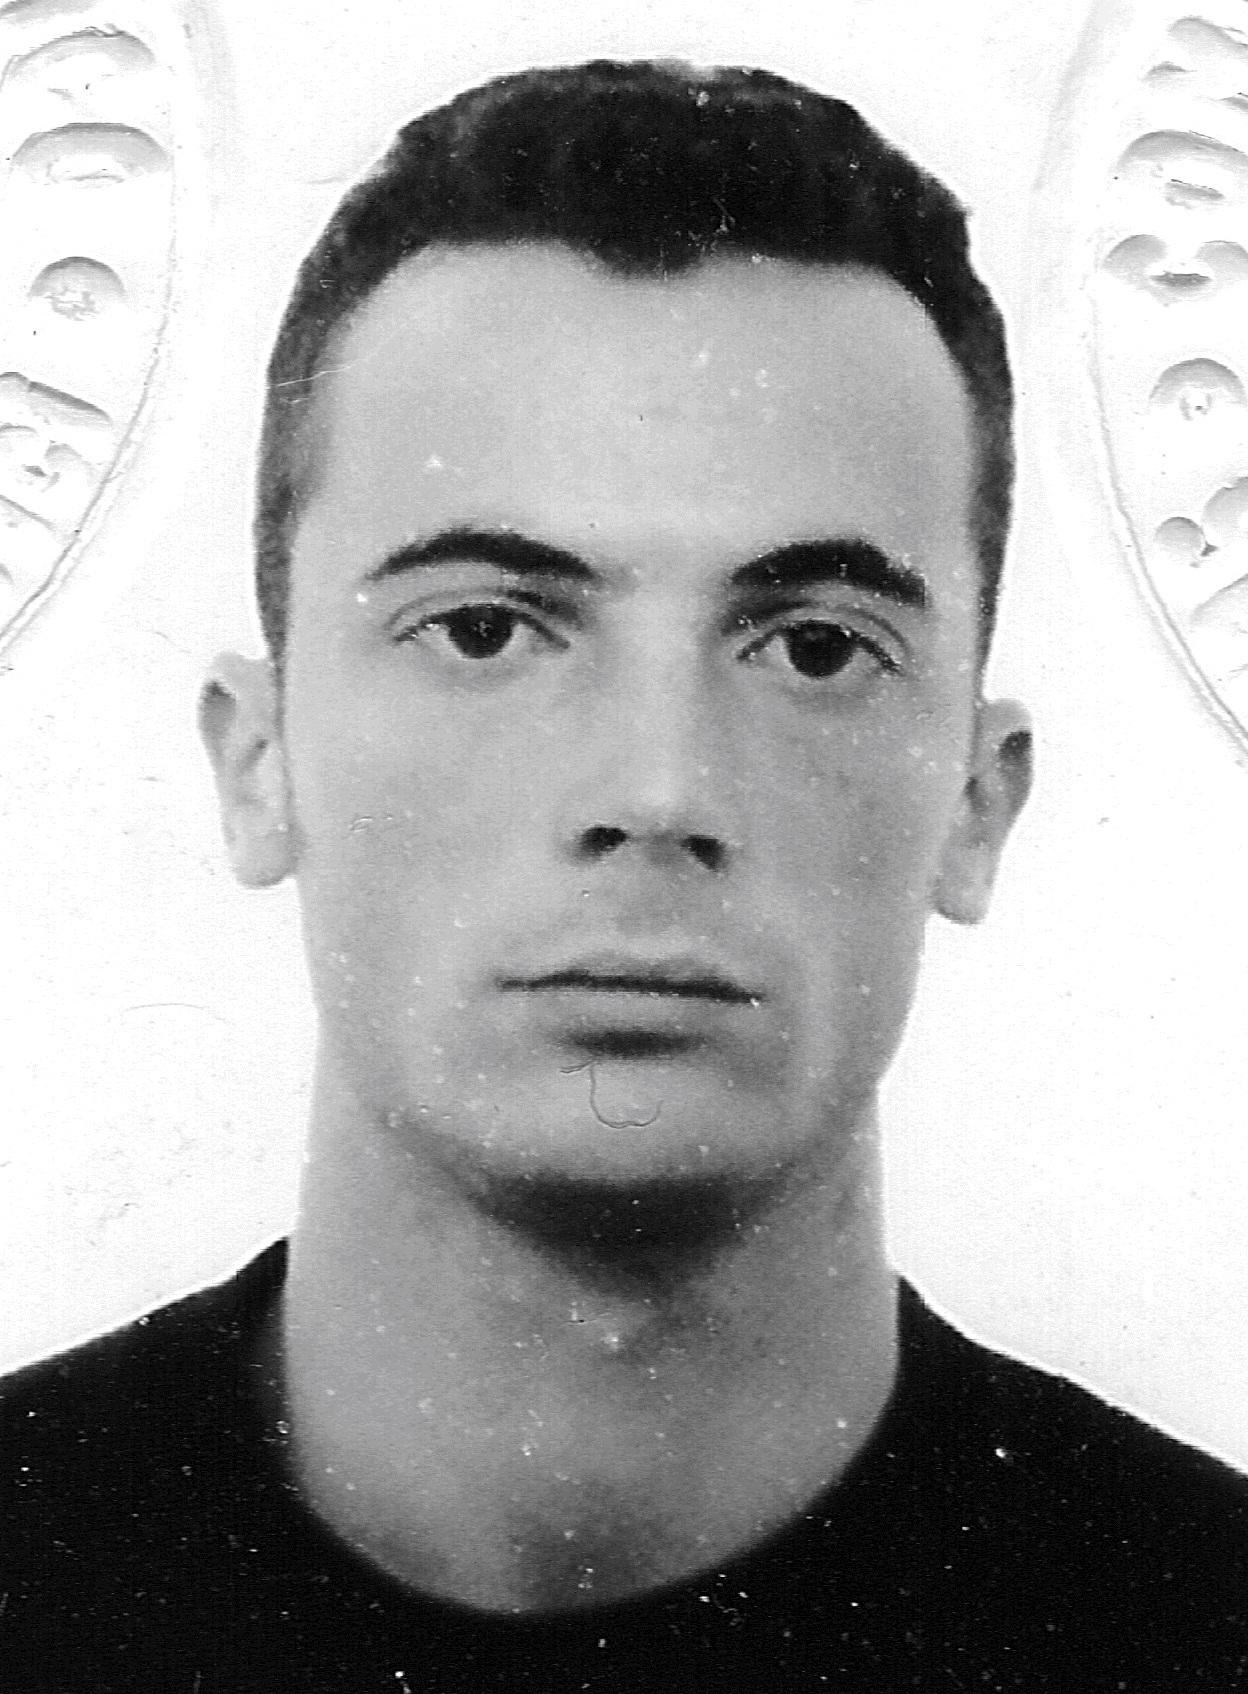 Bergamaschi